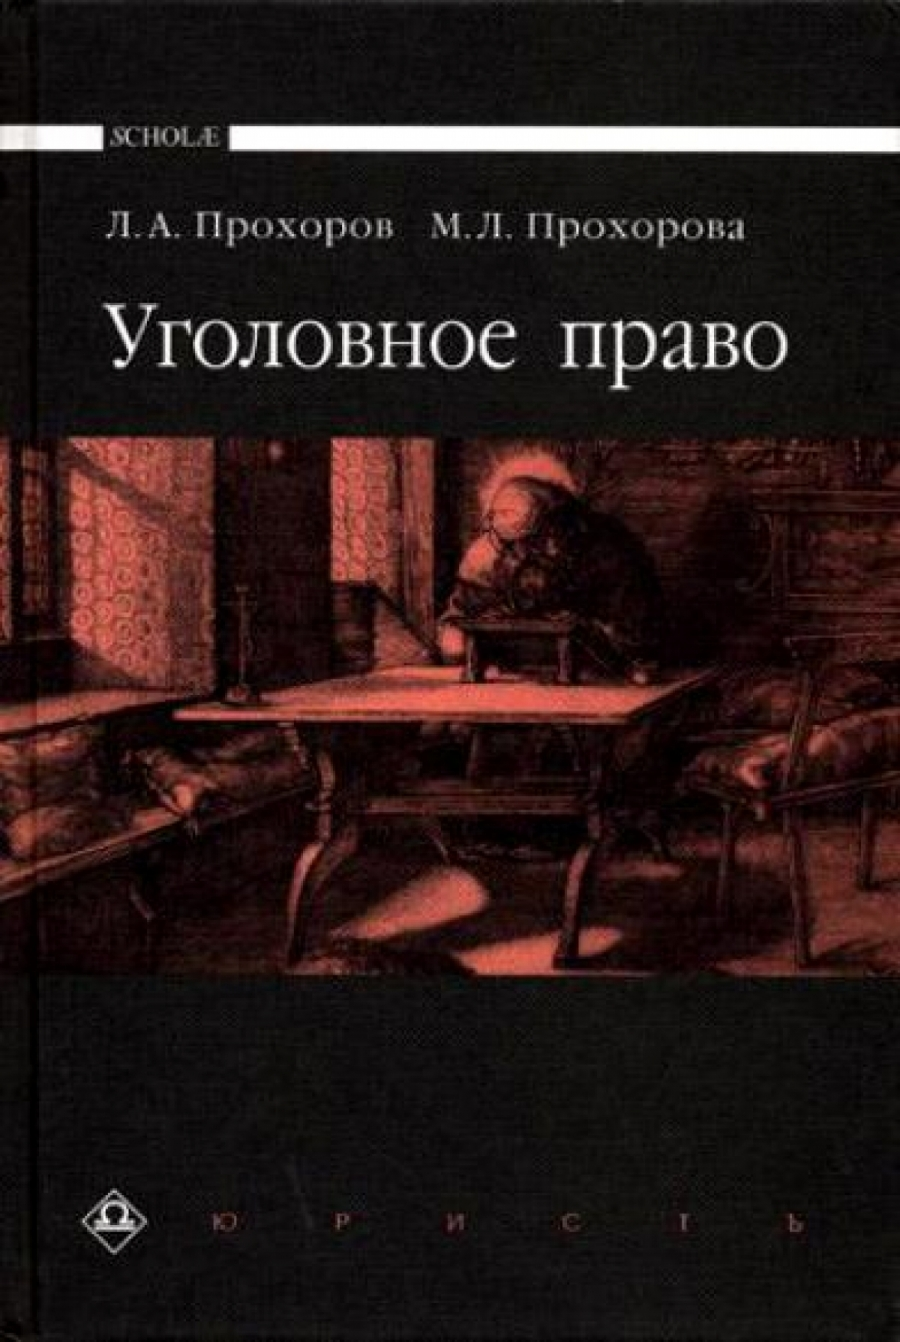 Обложка книги:  е.а. мизиковский - теория бухгалтерского учета